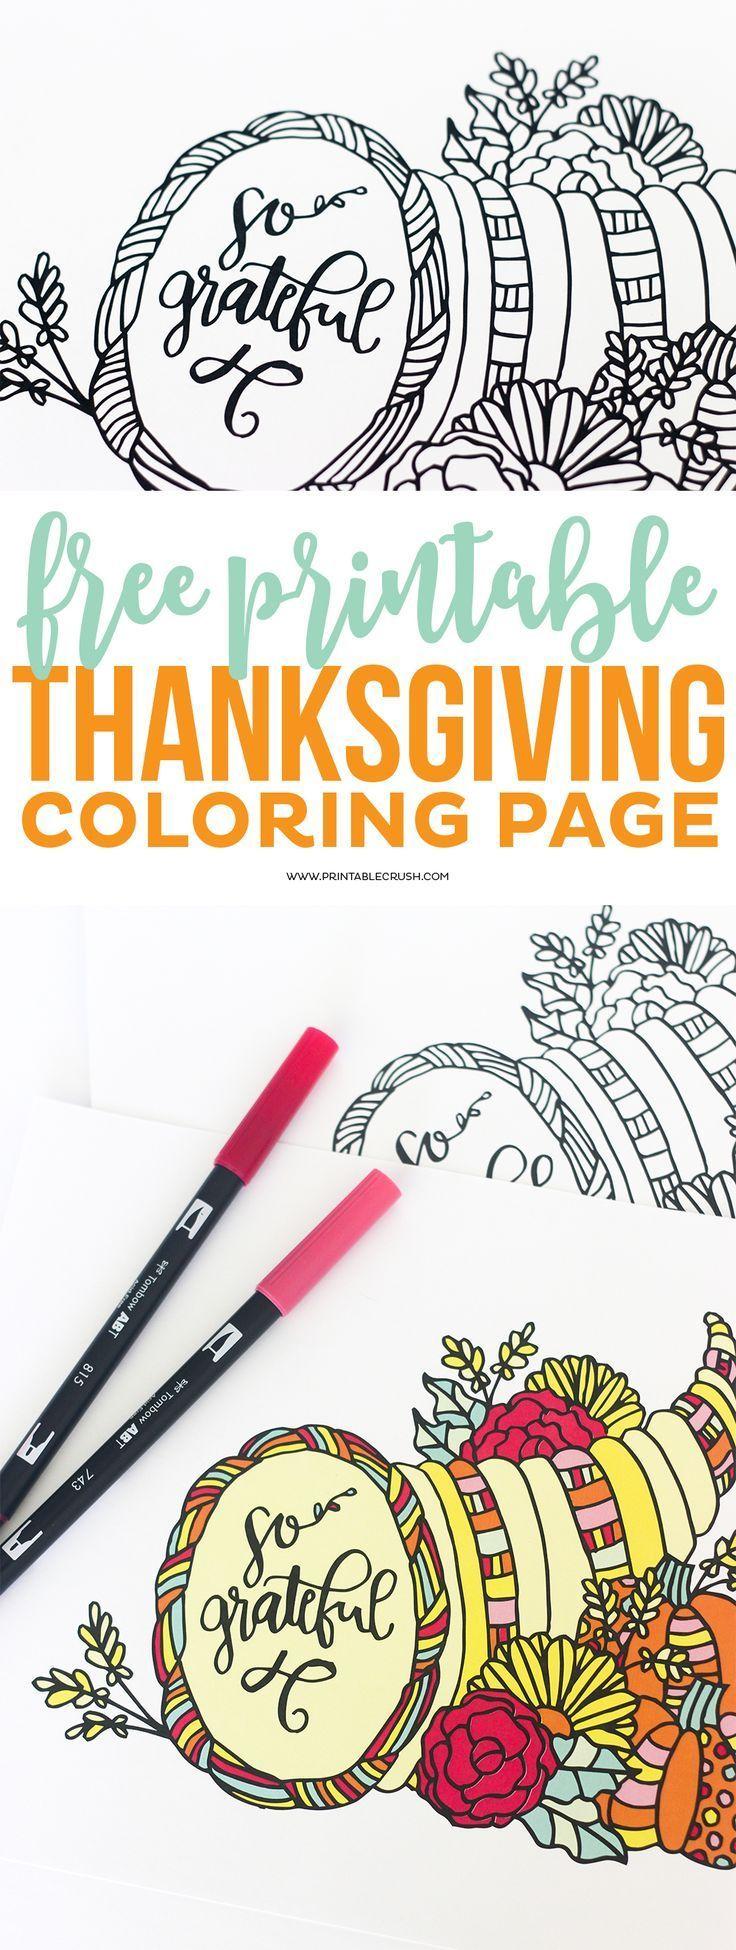 64 best Ausmalvorlagen images on Pinterest | Adult coloring pages ...